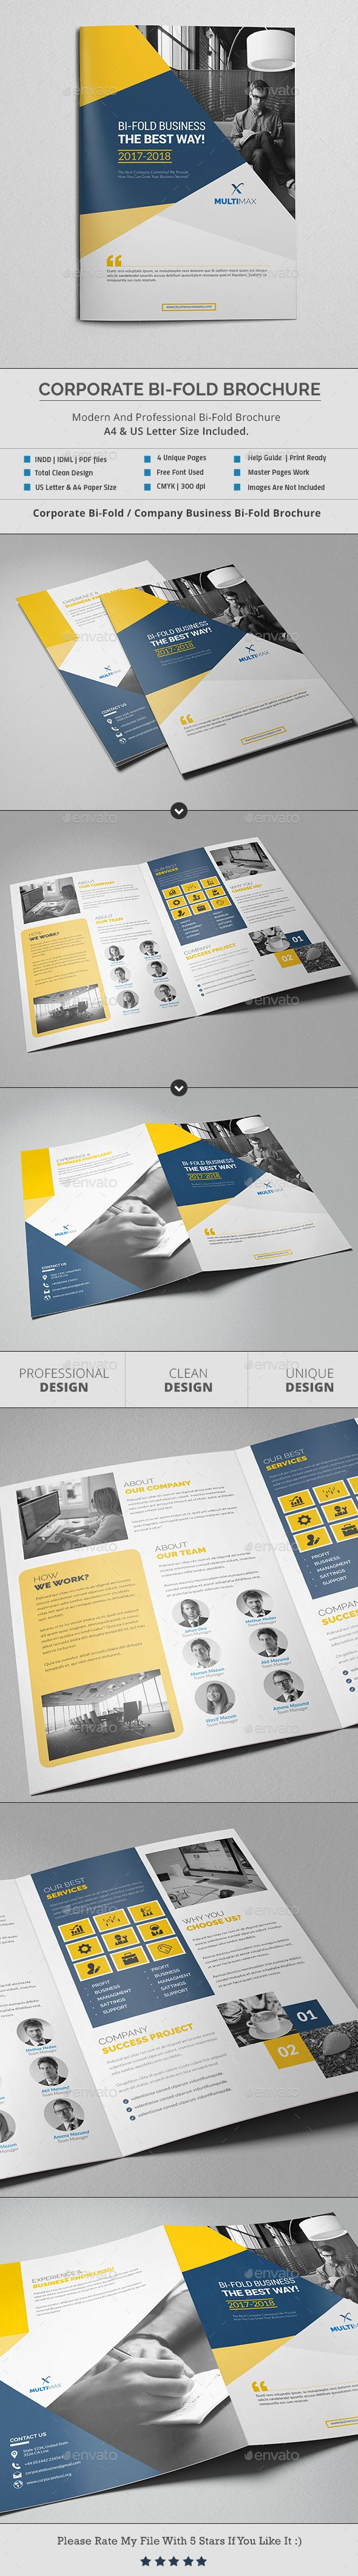 Bi-Fold Brochure Template - #Brochures Print #Templates Download here:  https://graphicriver.net/item/bifold-brochure-template/19419190?ref=alena994